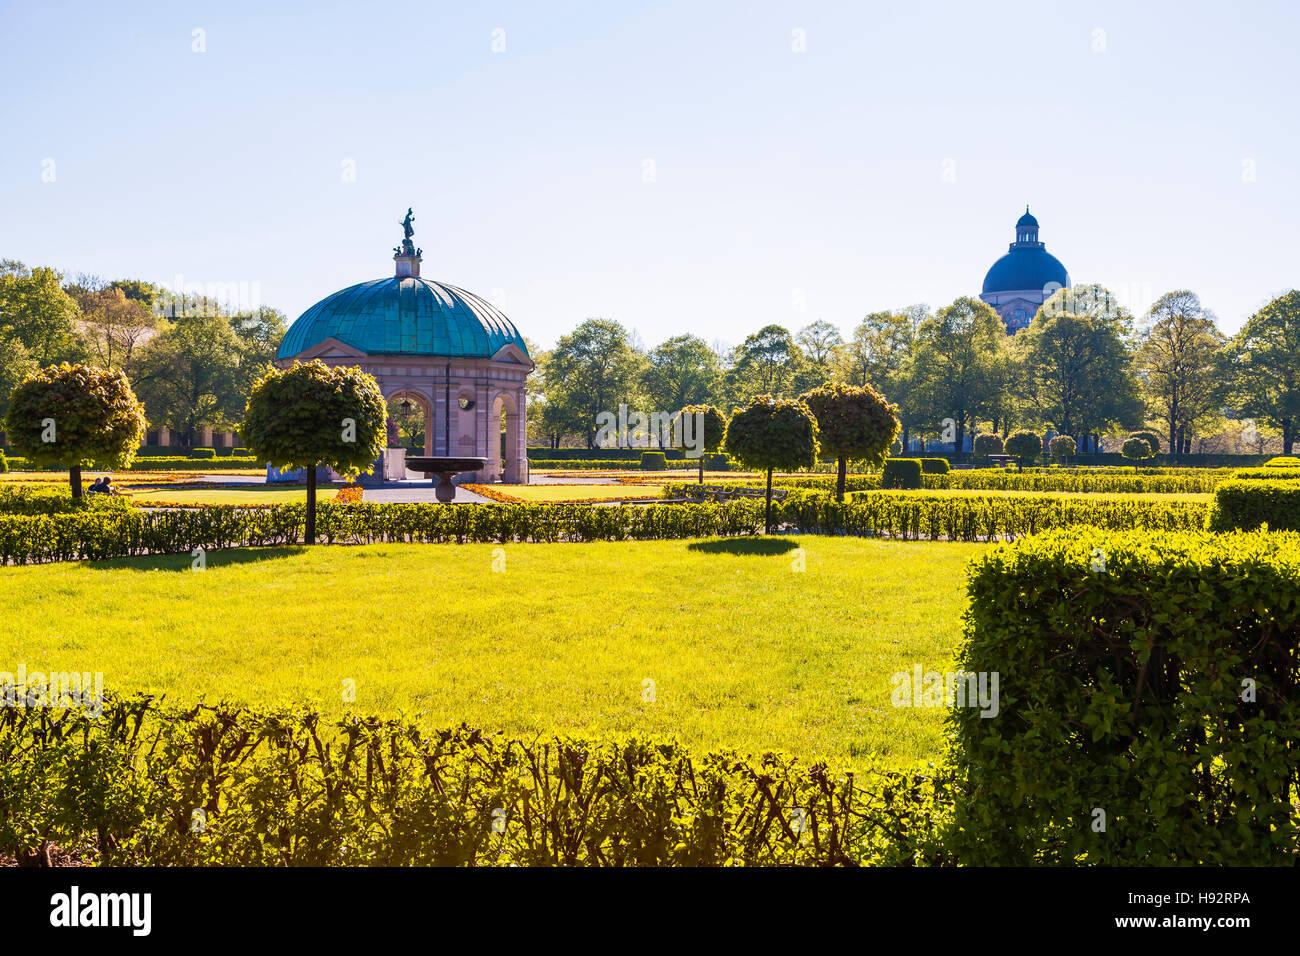 Giardino rinascimentale, Pavilion Hofgarten, Parco, Monaco di Baviera, Germania Immagini Stock